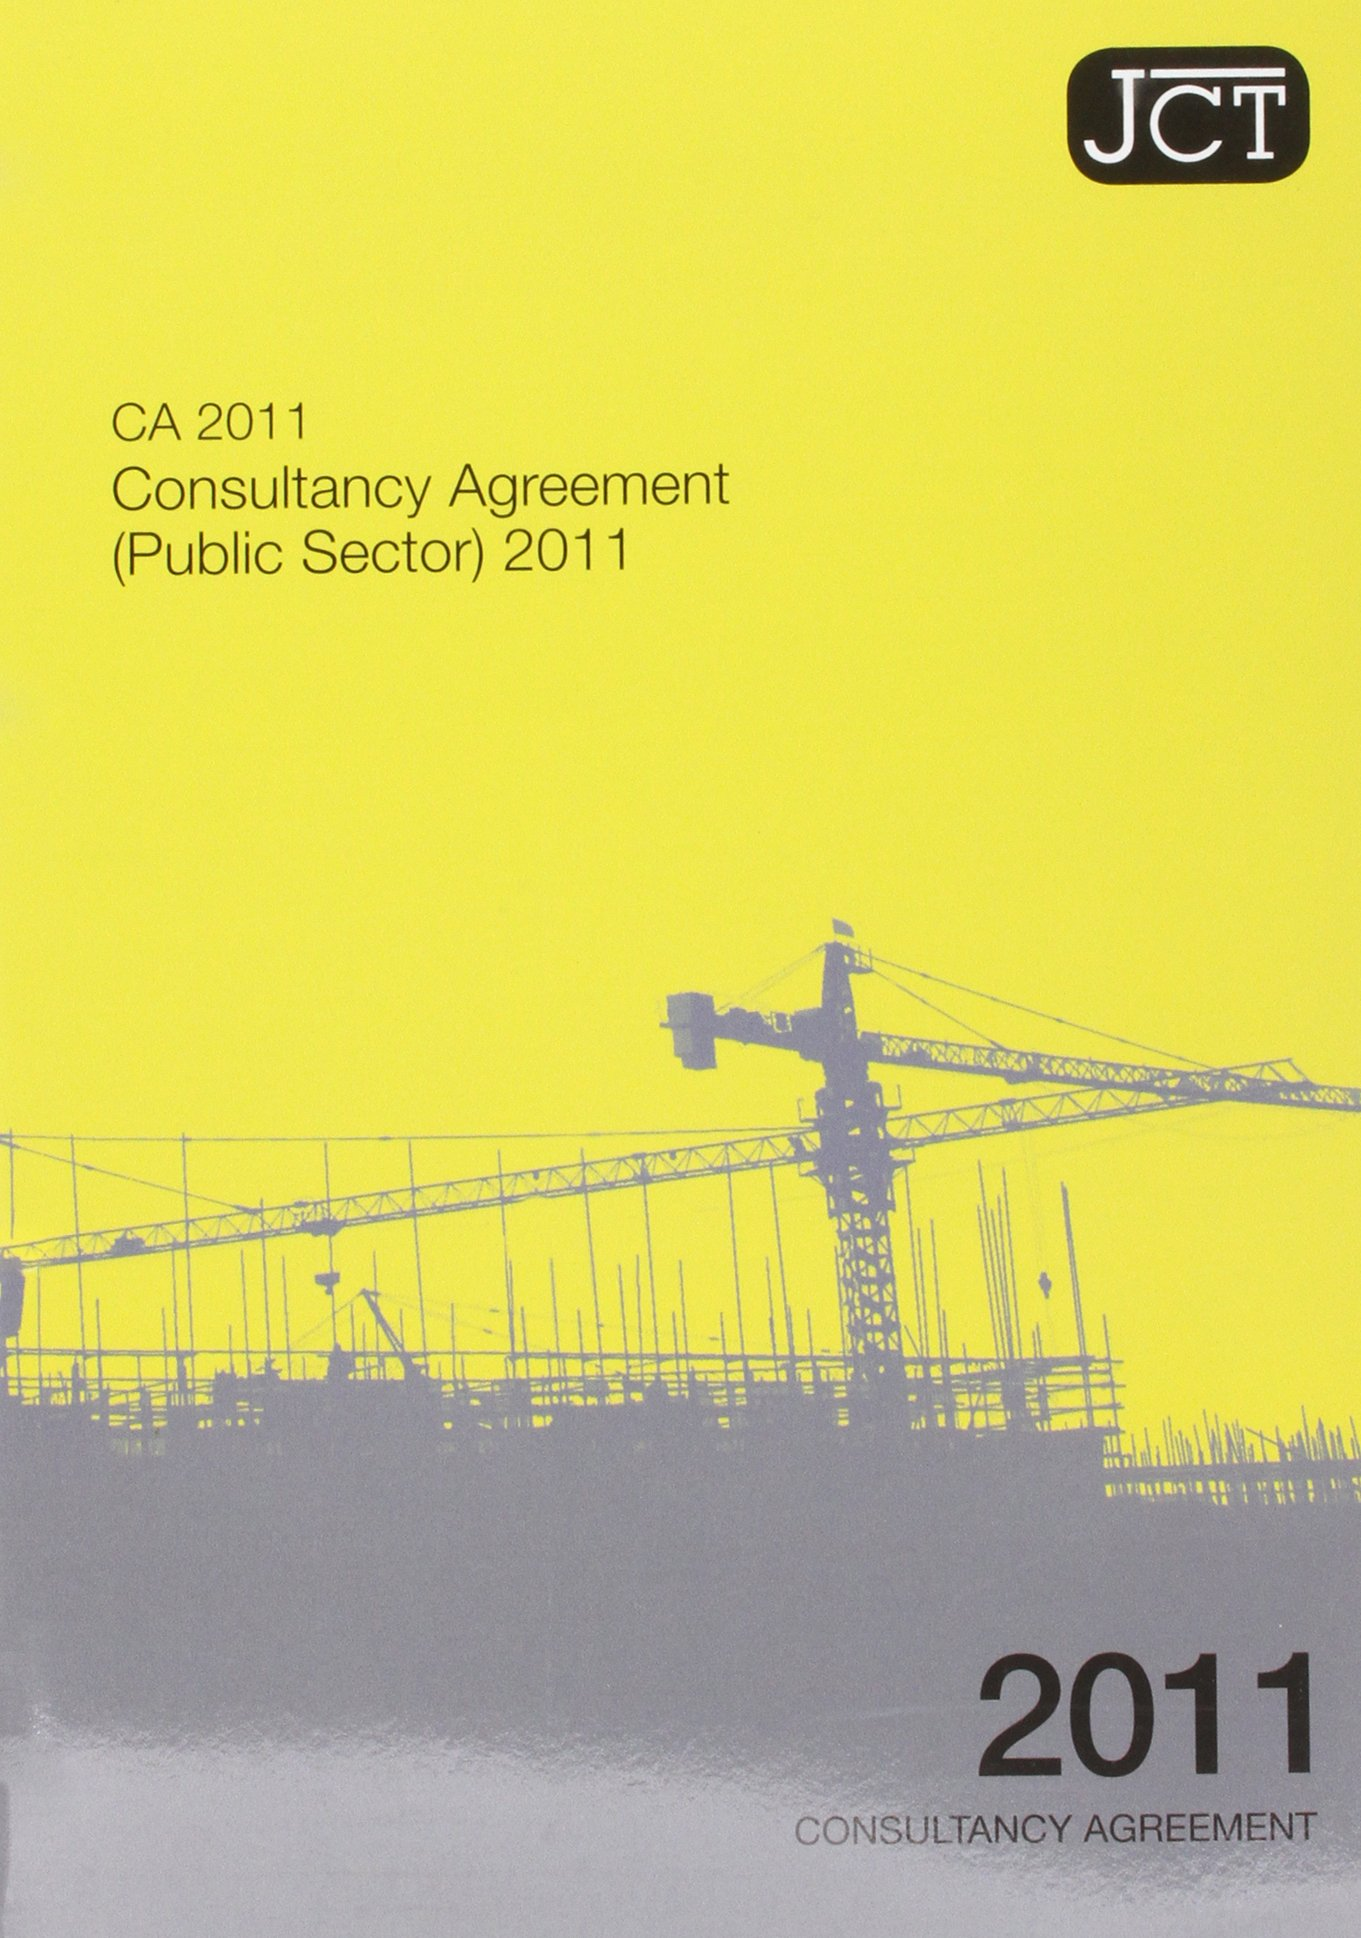 Jct consultancy agreement public sector 9780414046634 amazon jct consultancy agreement public sector 9780414046634 amazon books platinumwayz